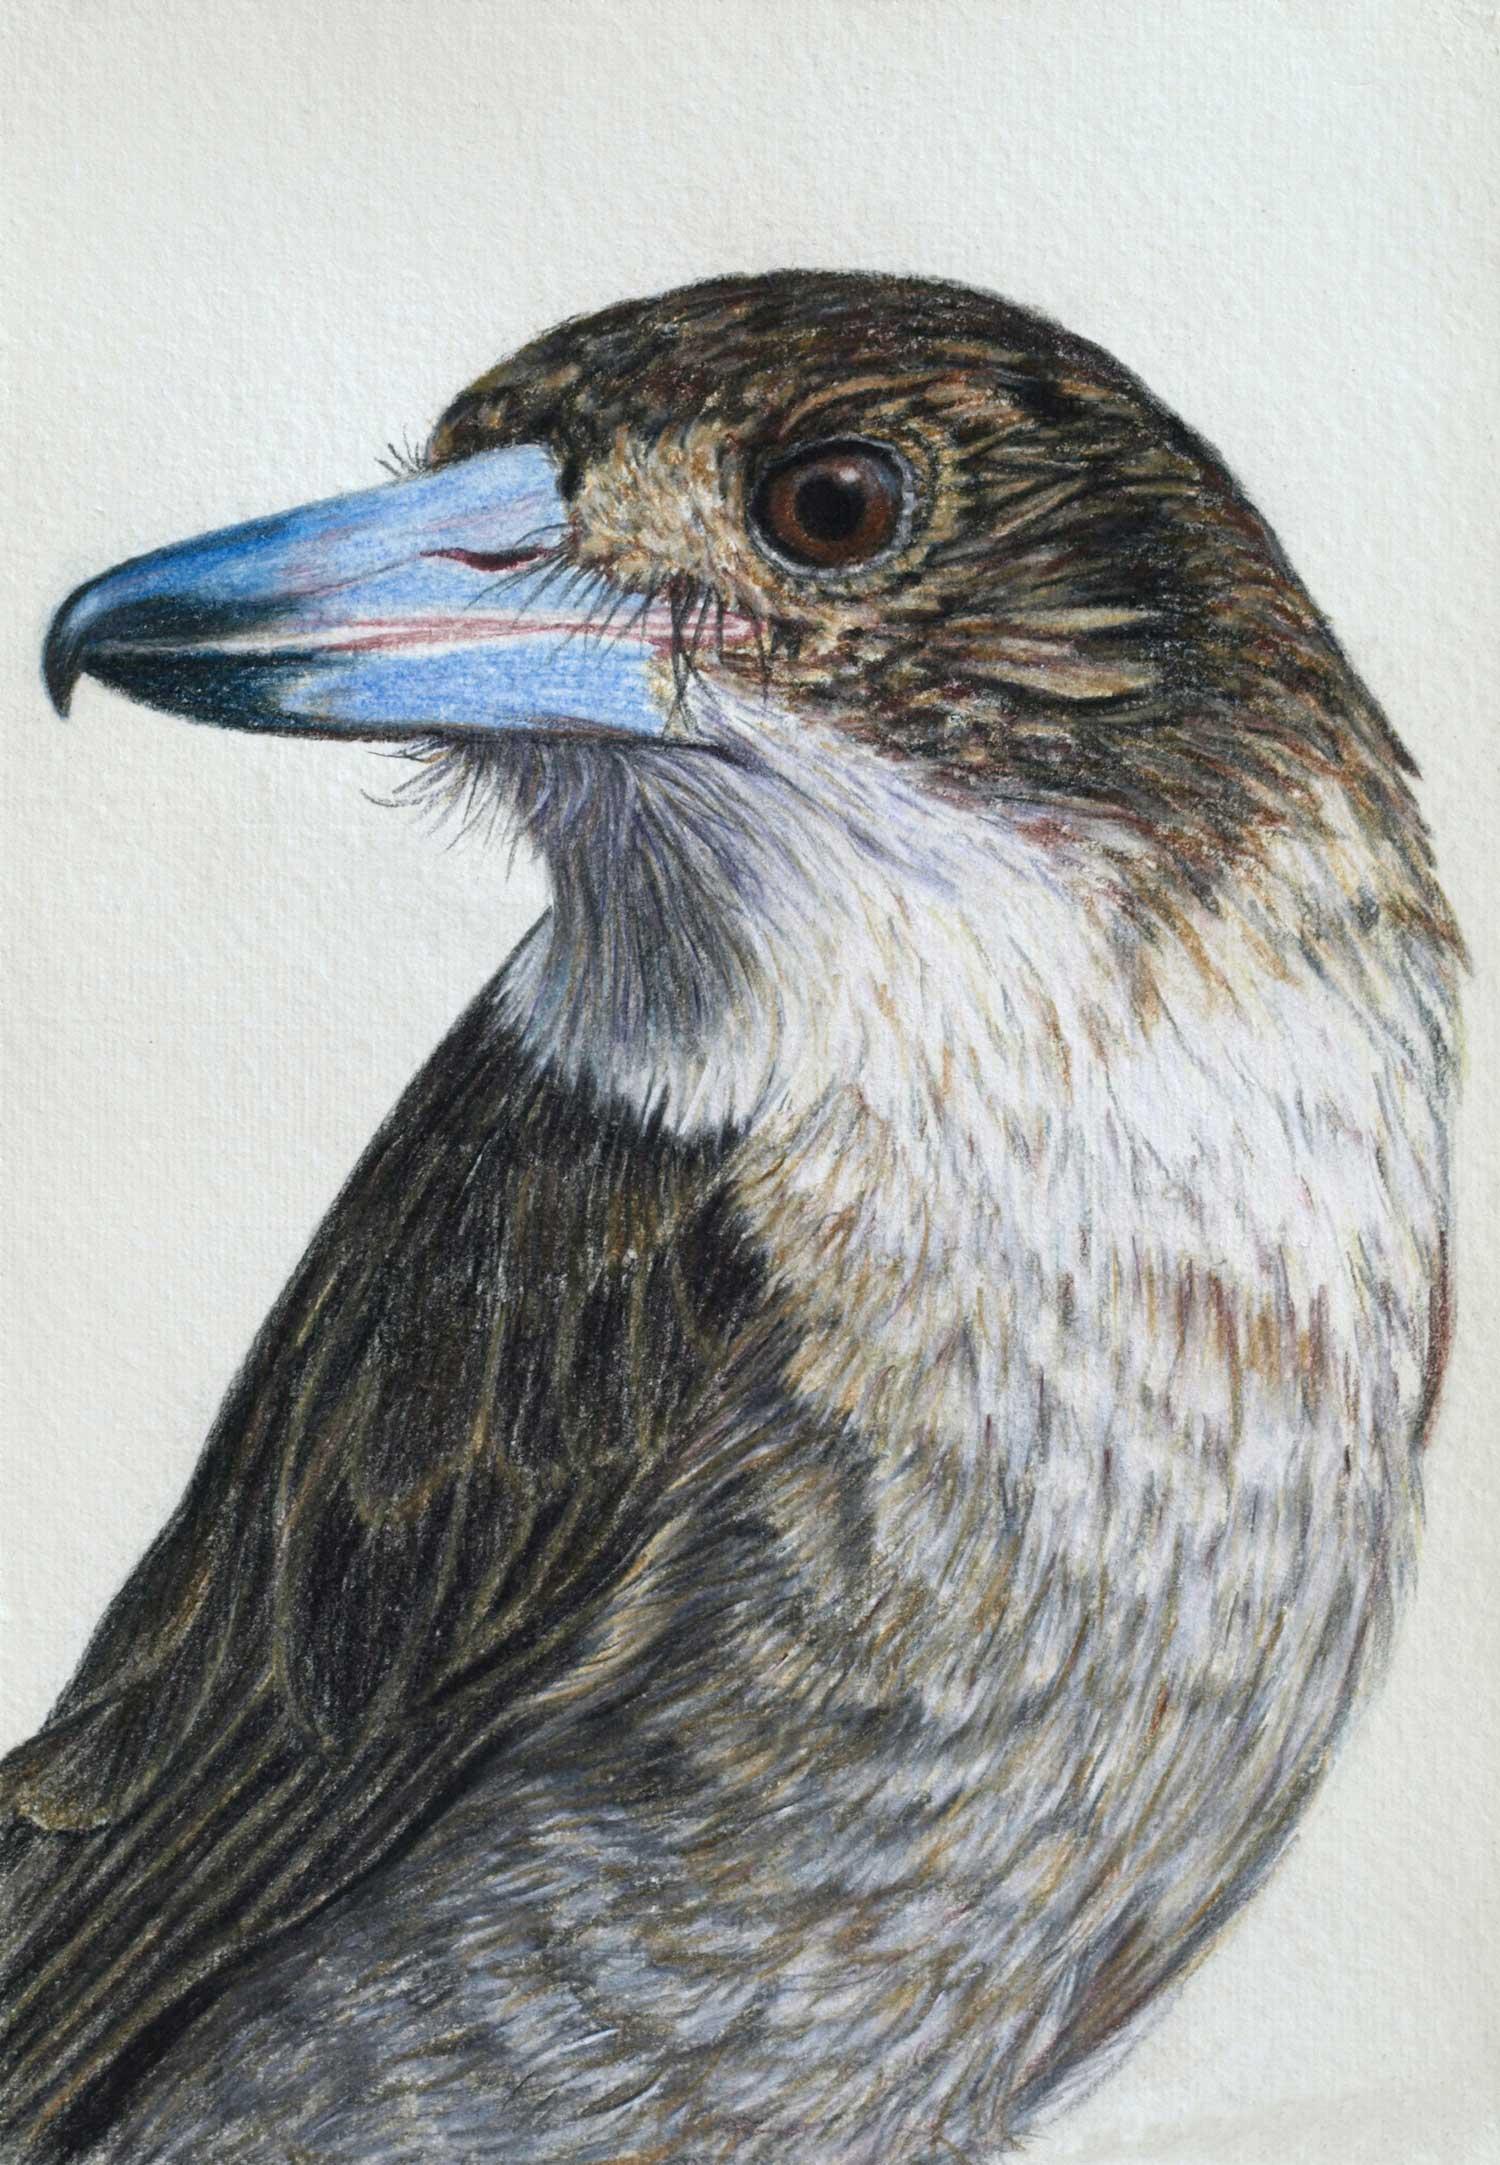 butcher-bird-drawing-rachel-newling.jpg